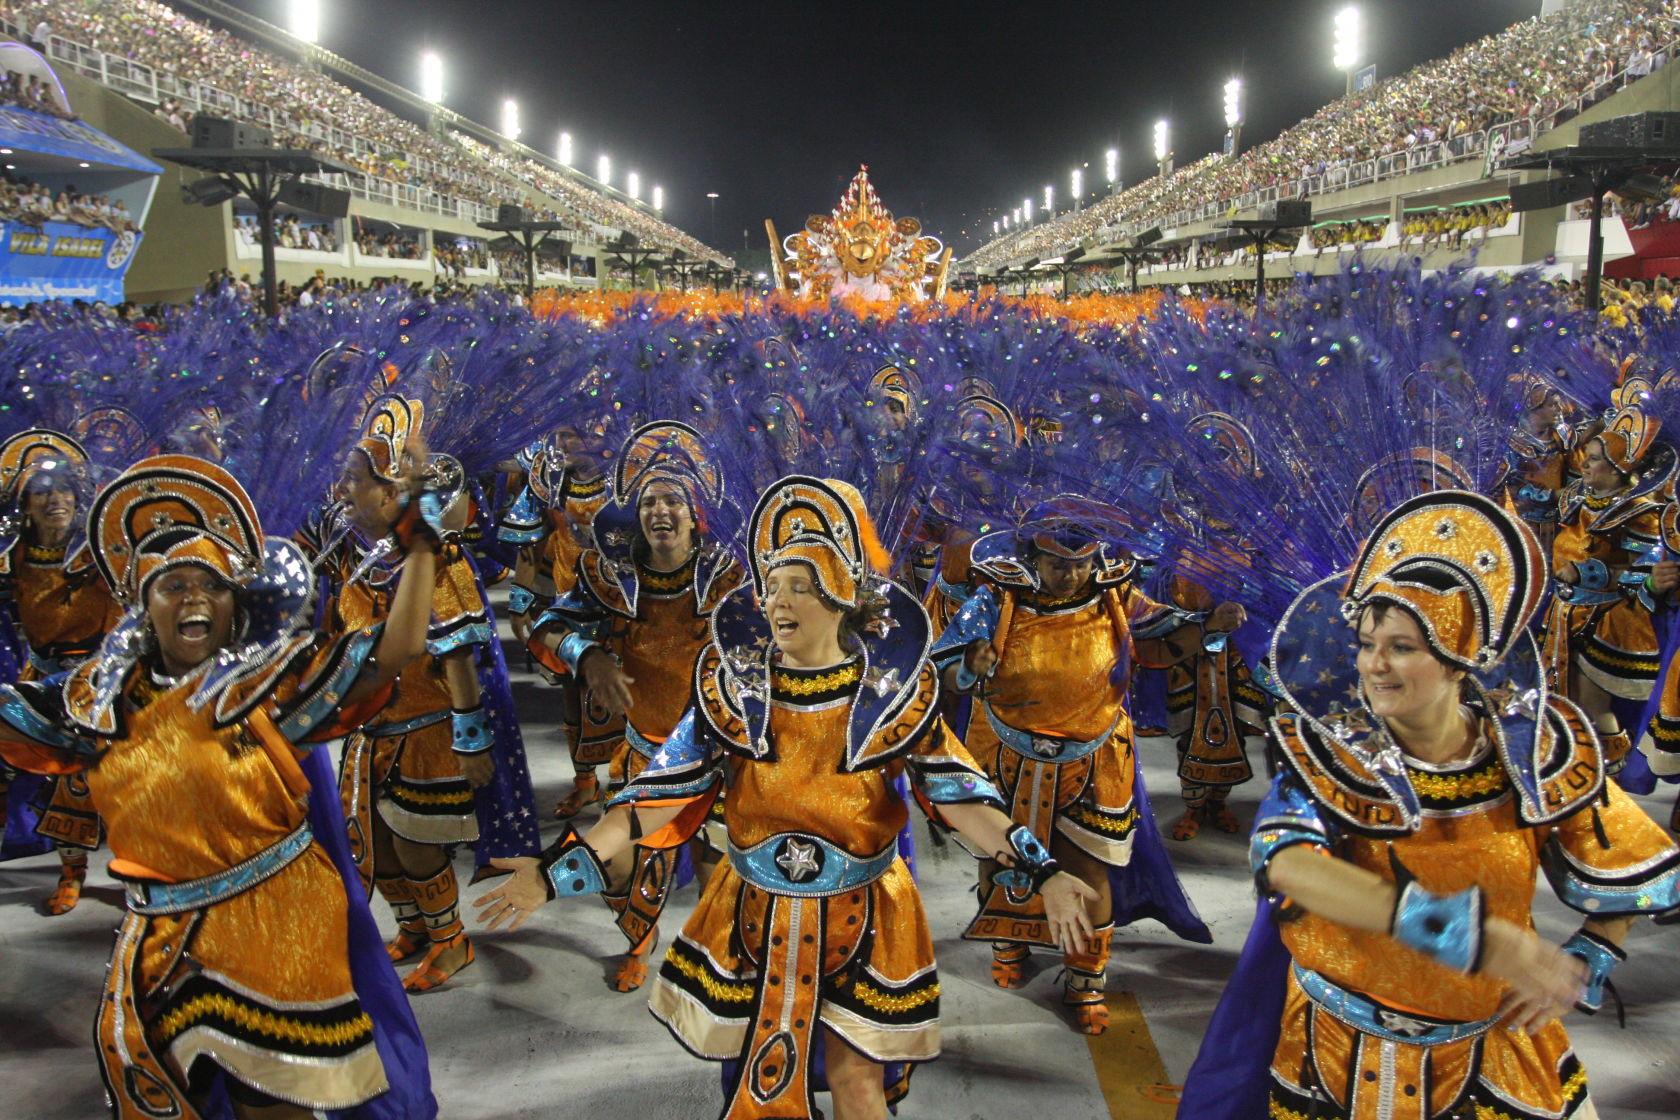 Rio Carnaval - Rafael Moraes-Salgueiro